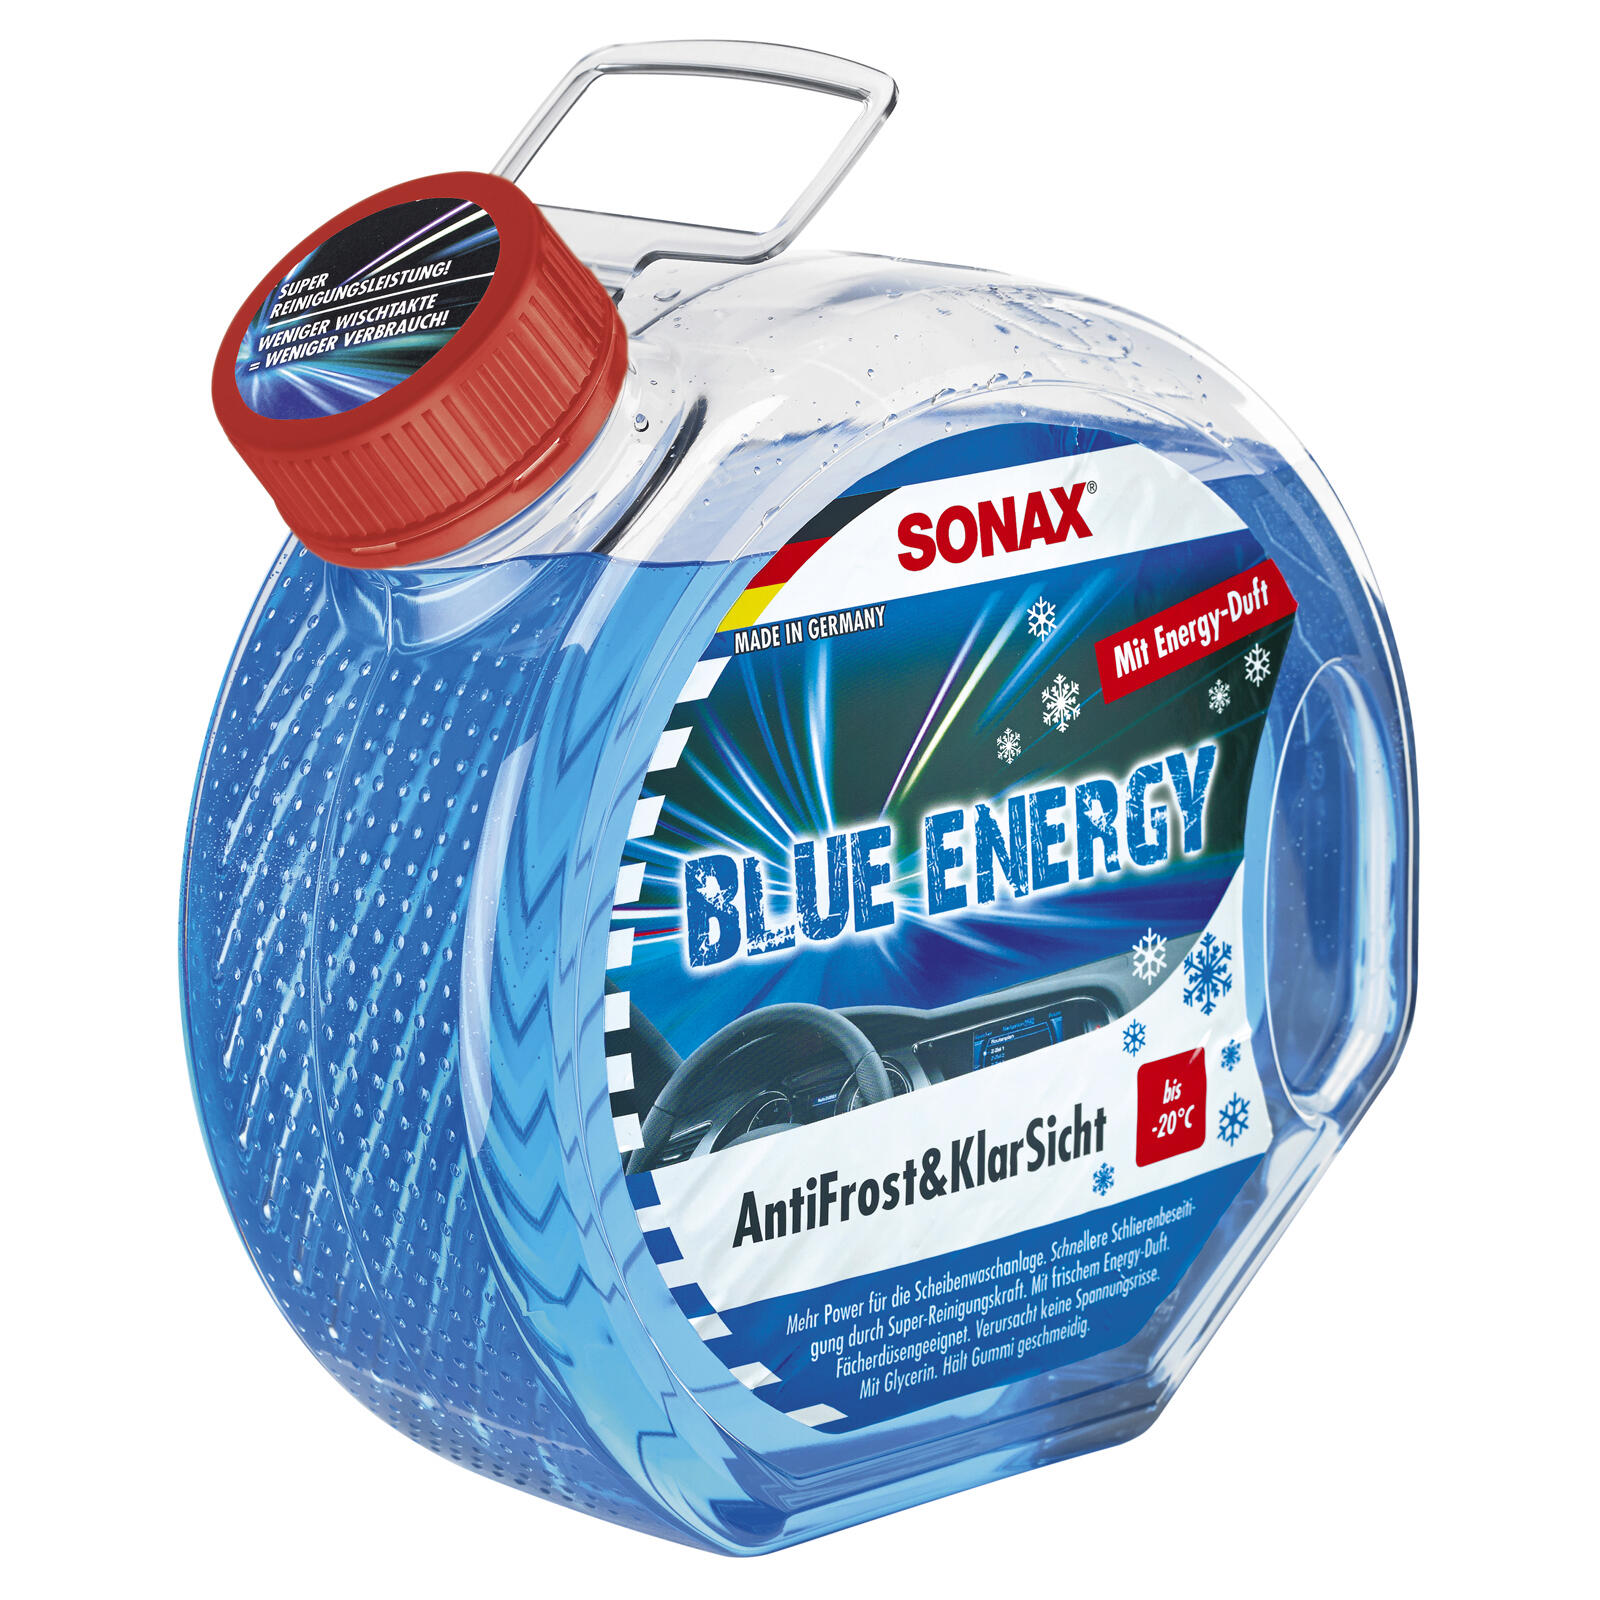 SONAX AntiFrost&KlarSicht BlueEnergy -20°C 3l